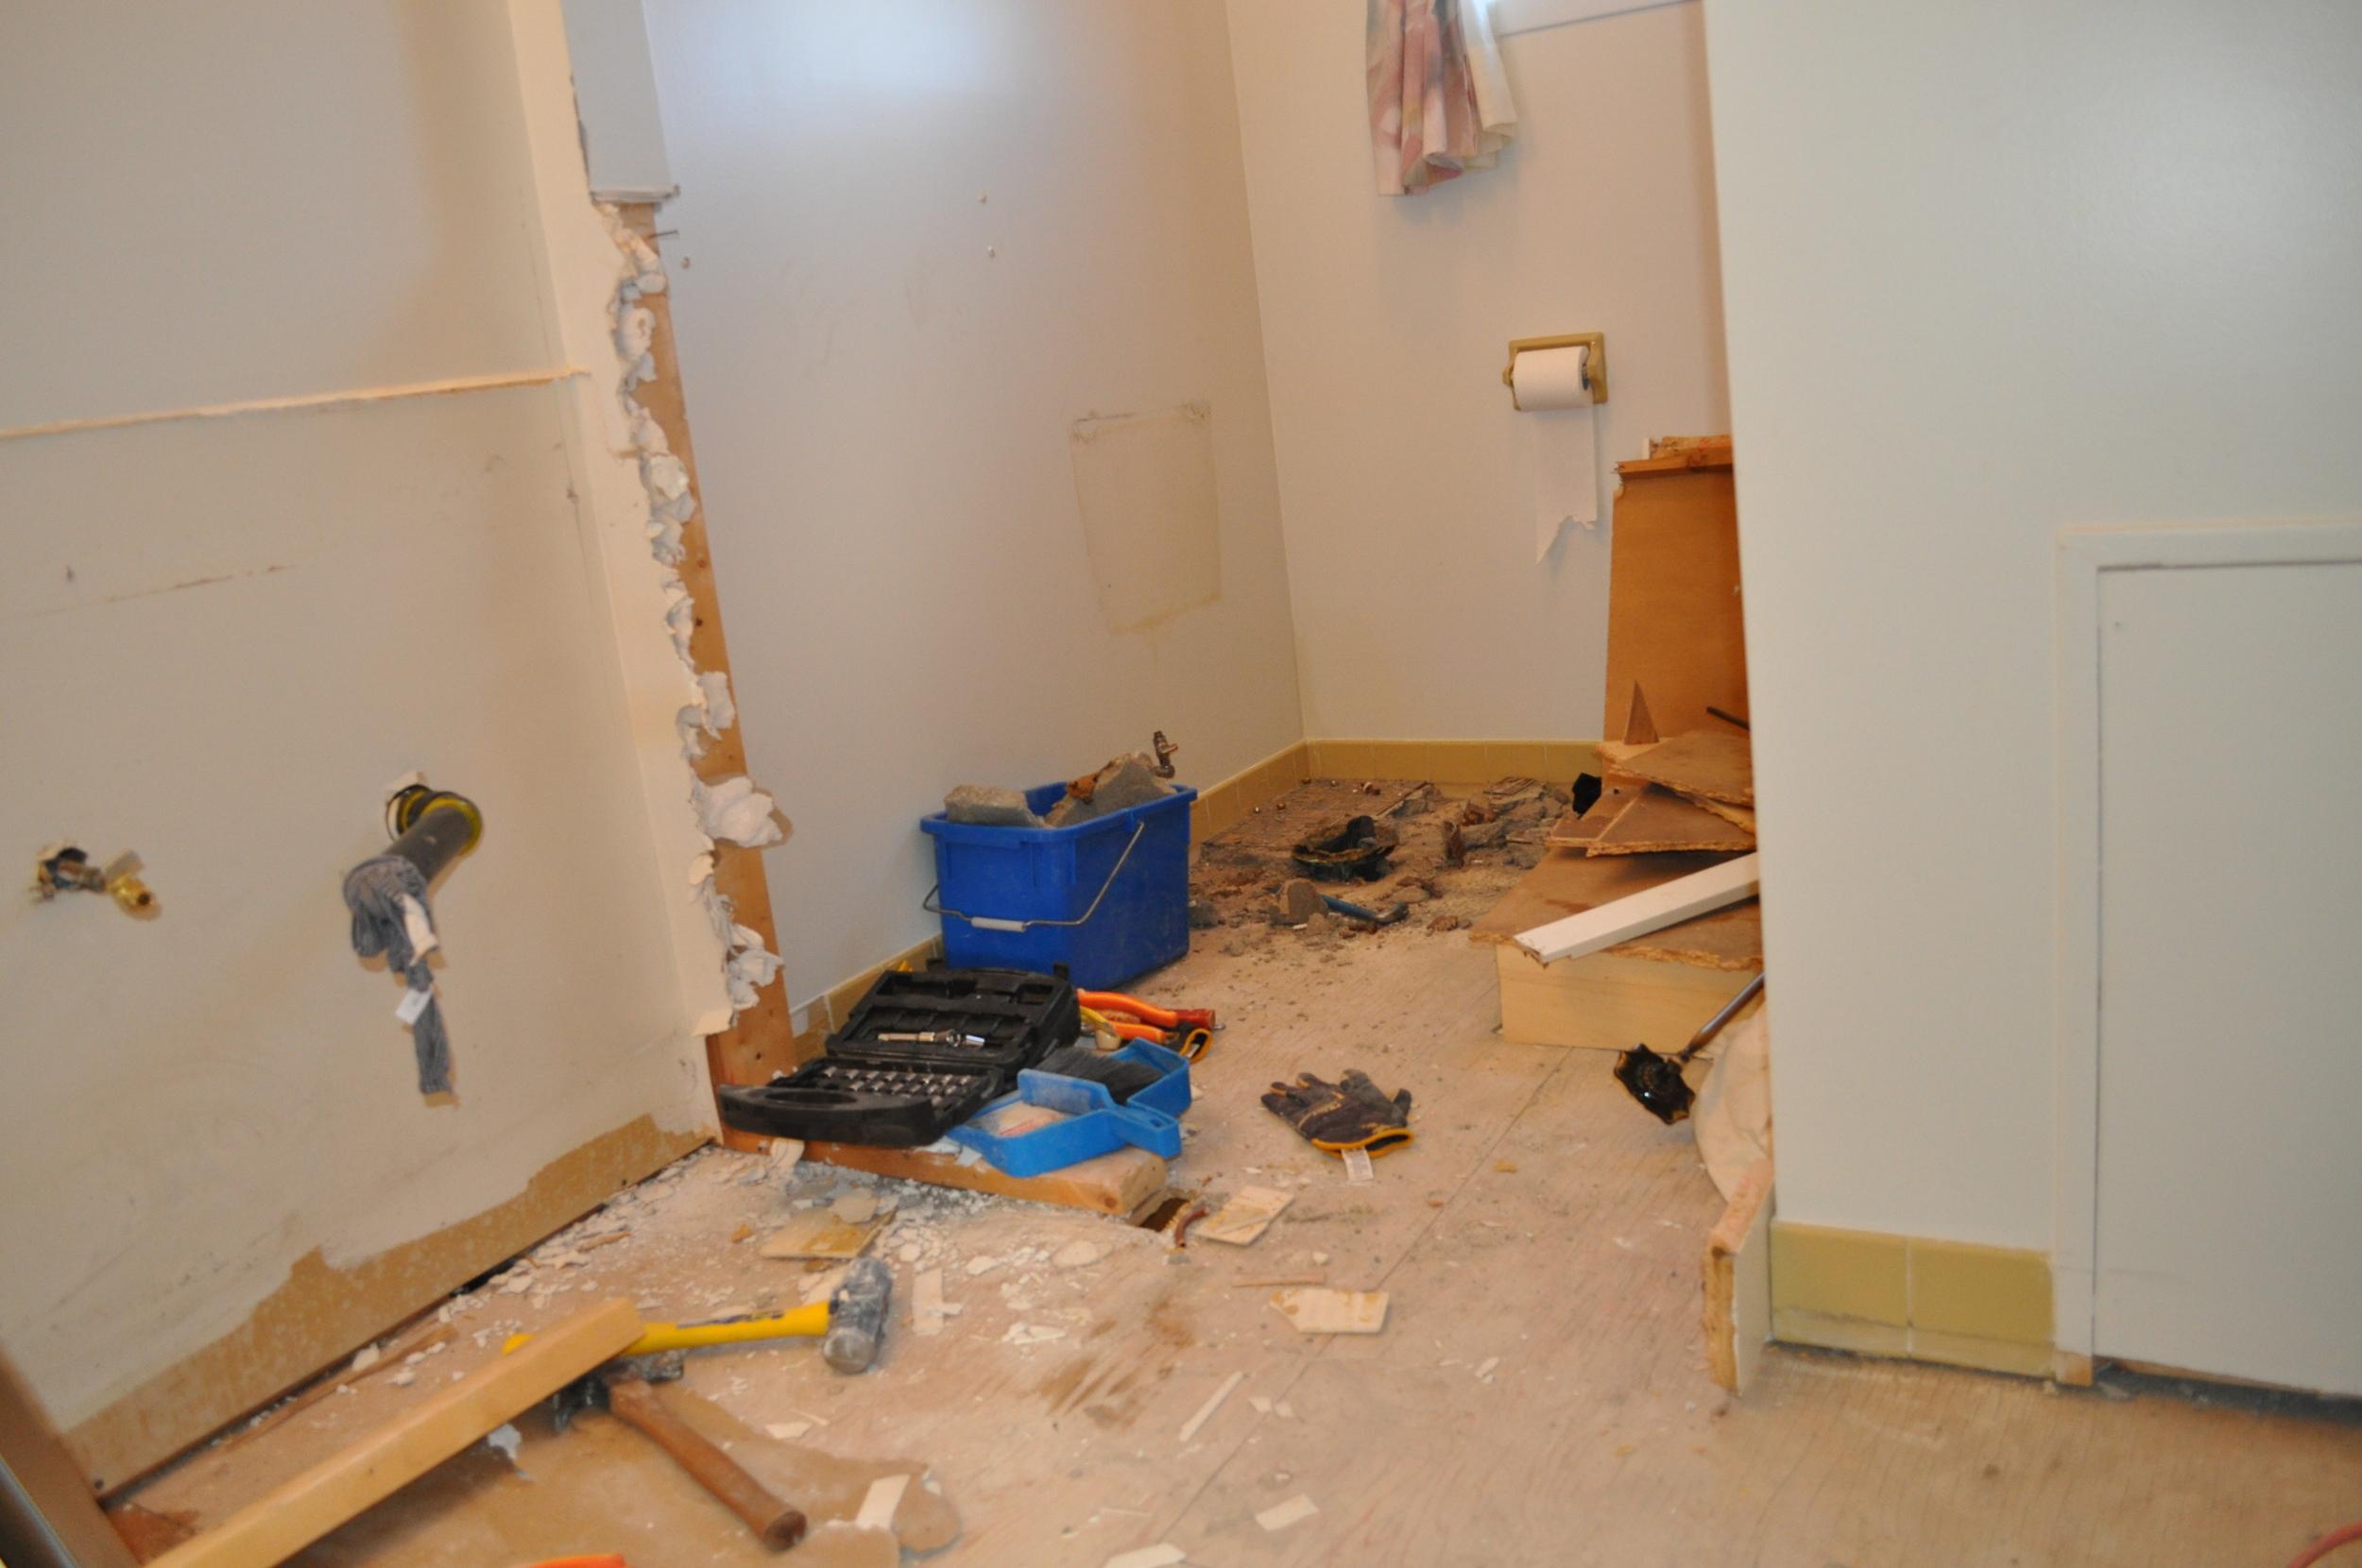 Main Bathroom, minus the vanity and toilet